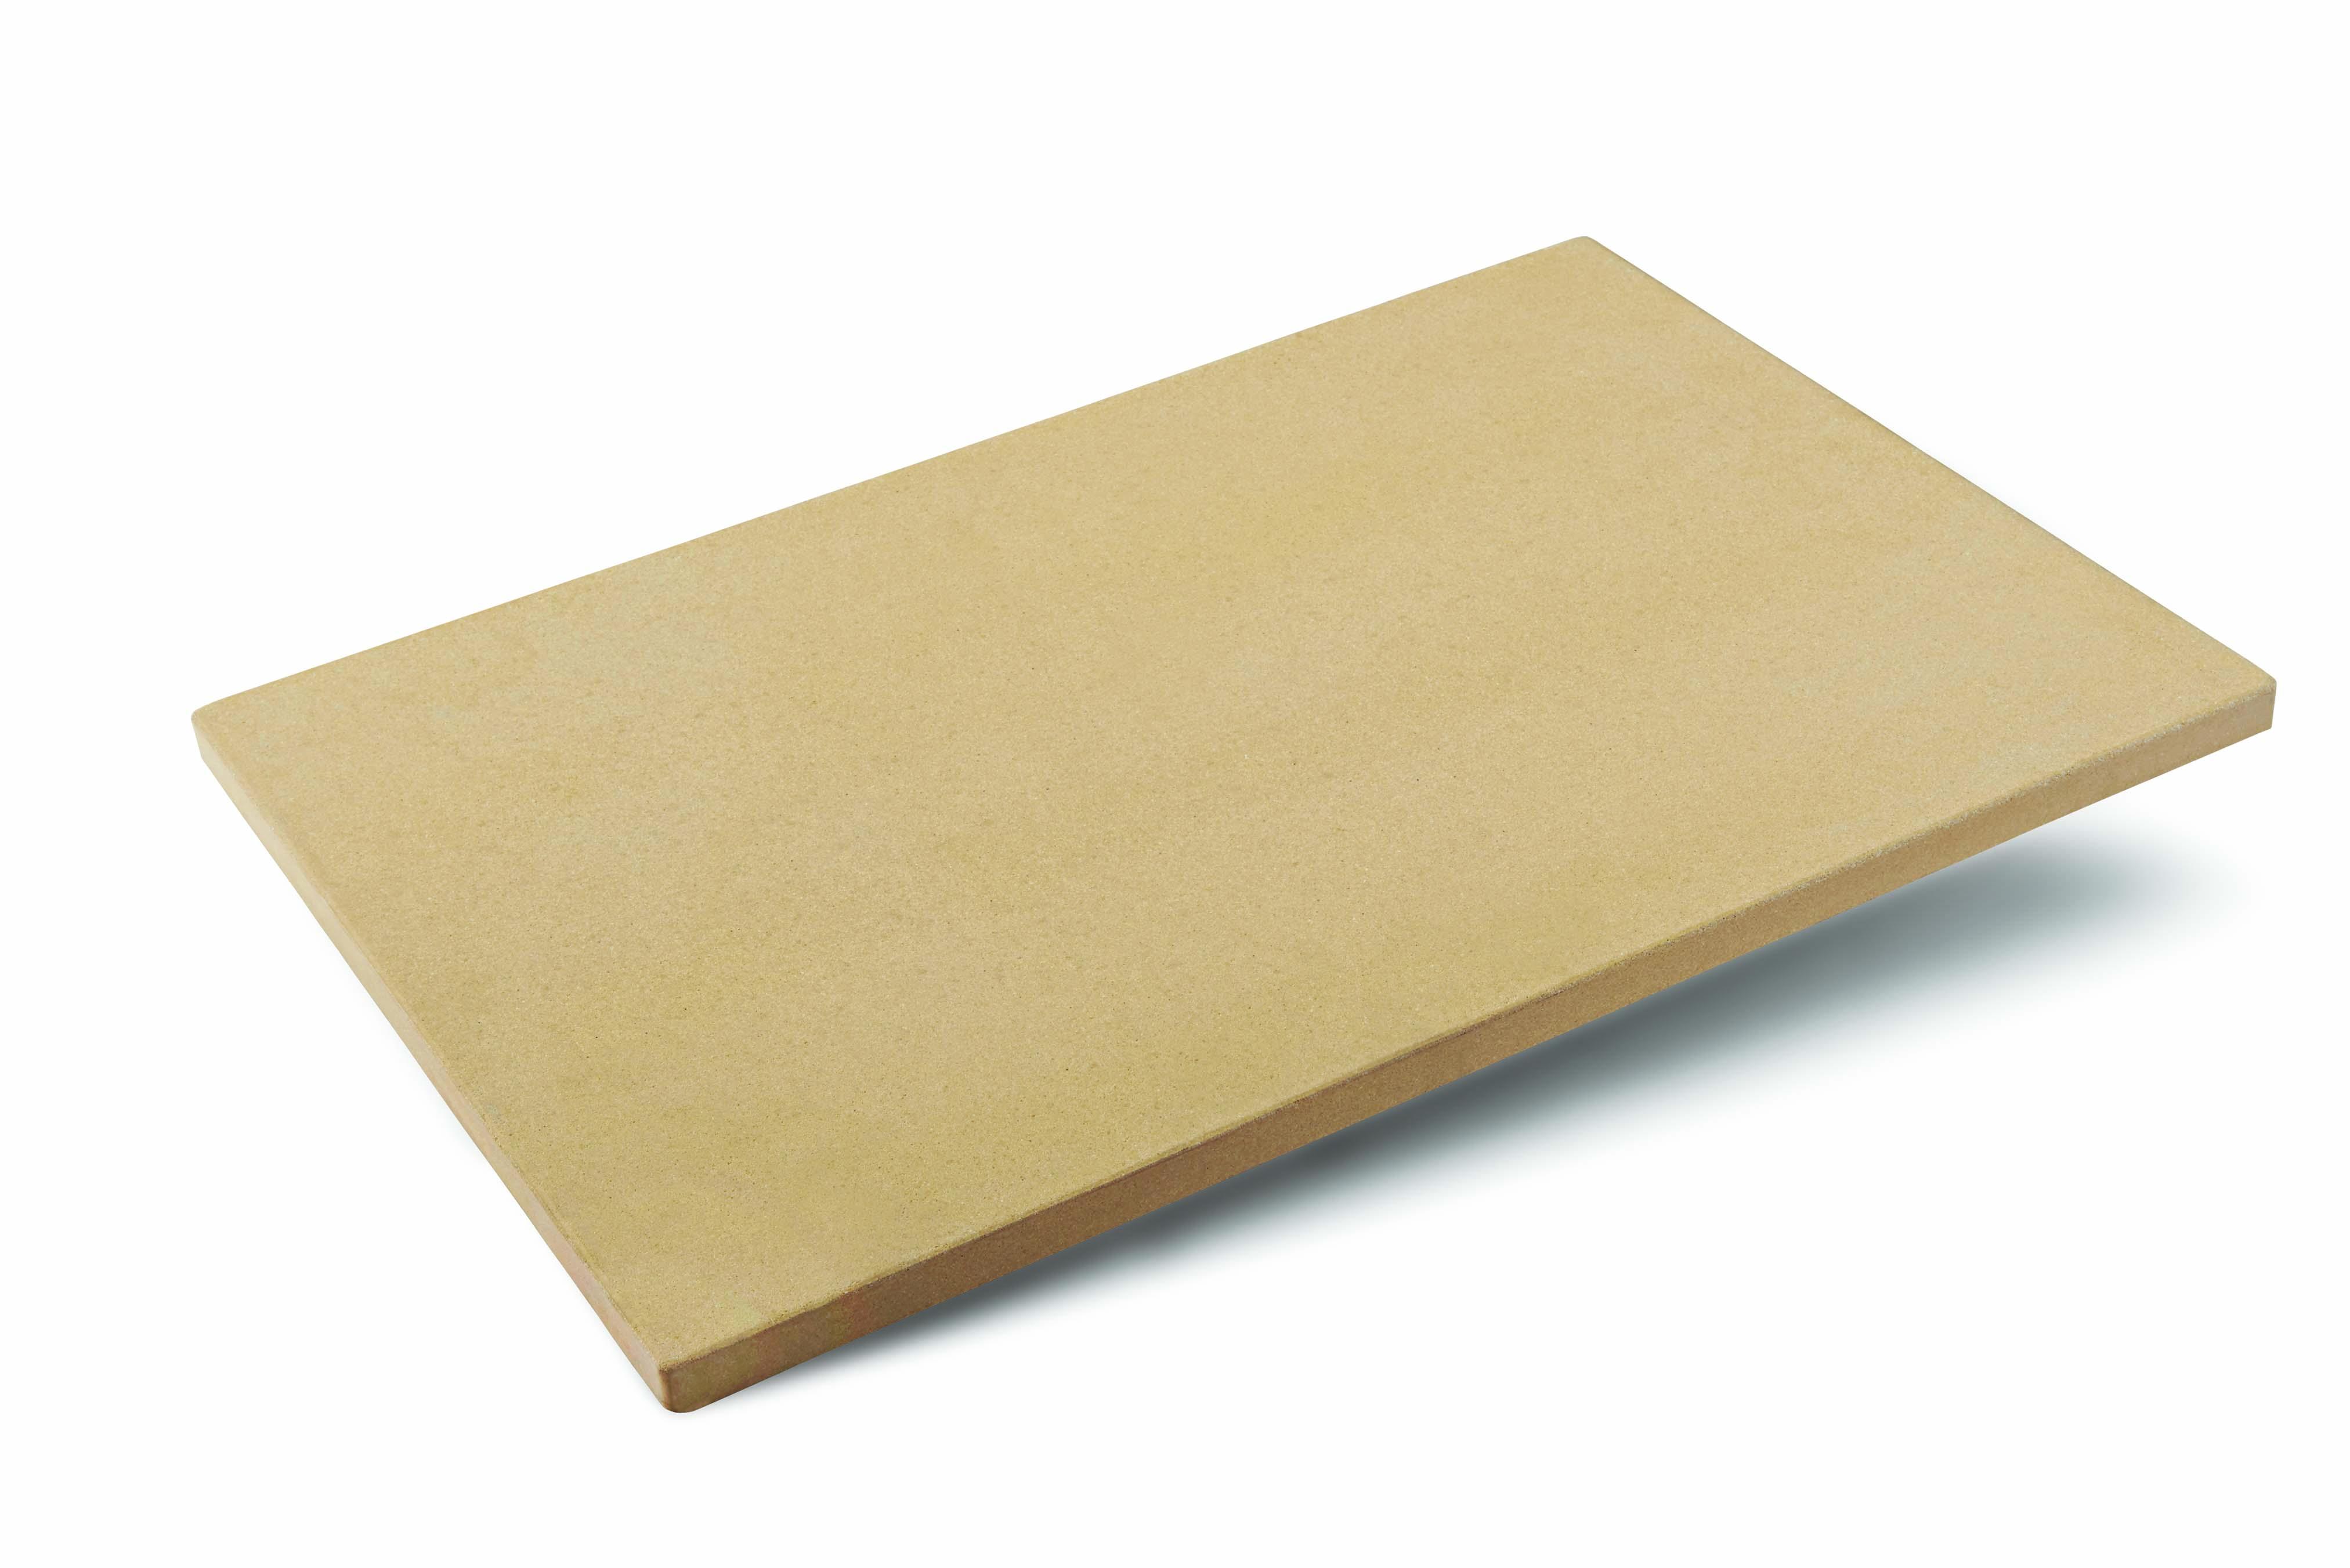 Napoleon Holzkohlegrill Ersatzteile : Napoleon pizzastein rechteckig